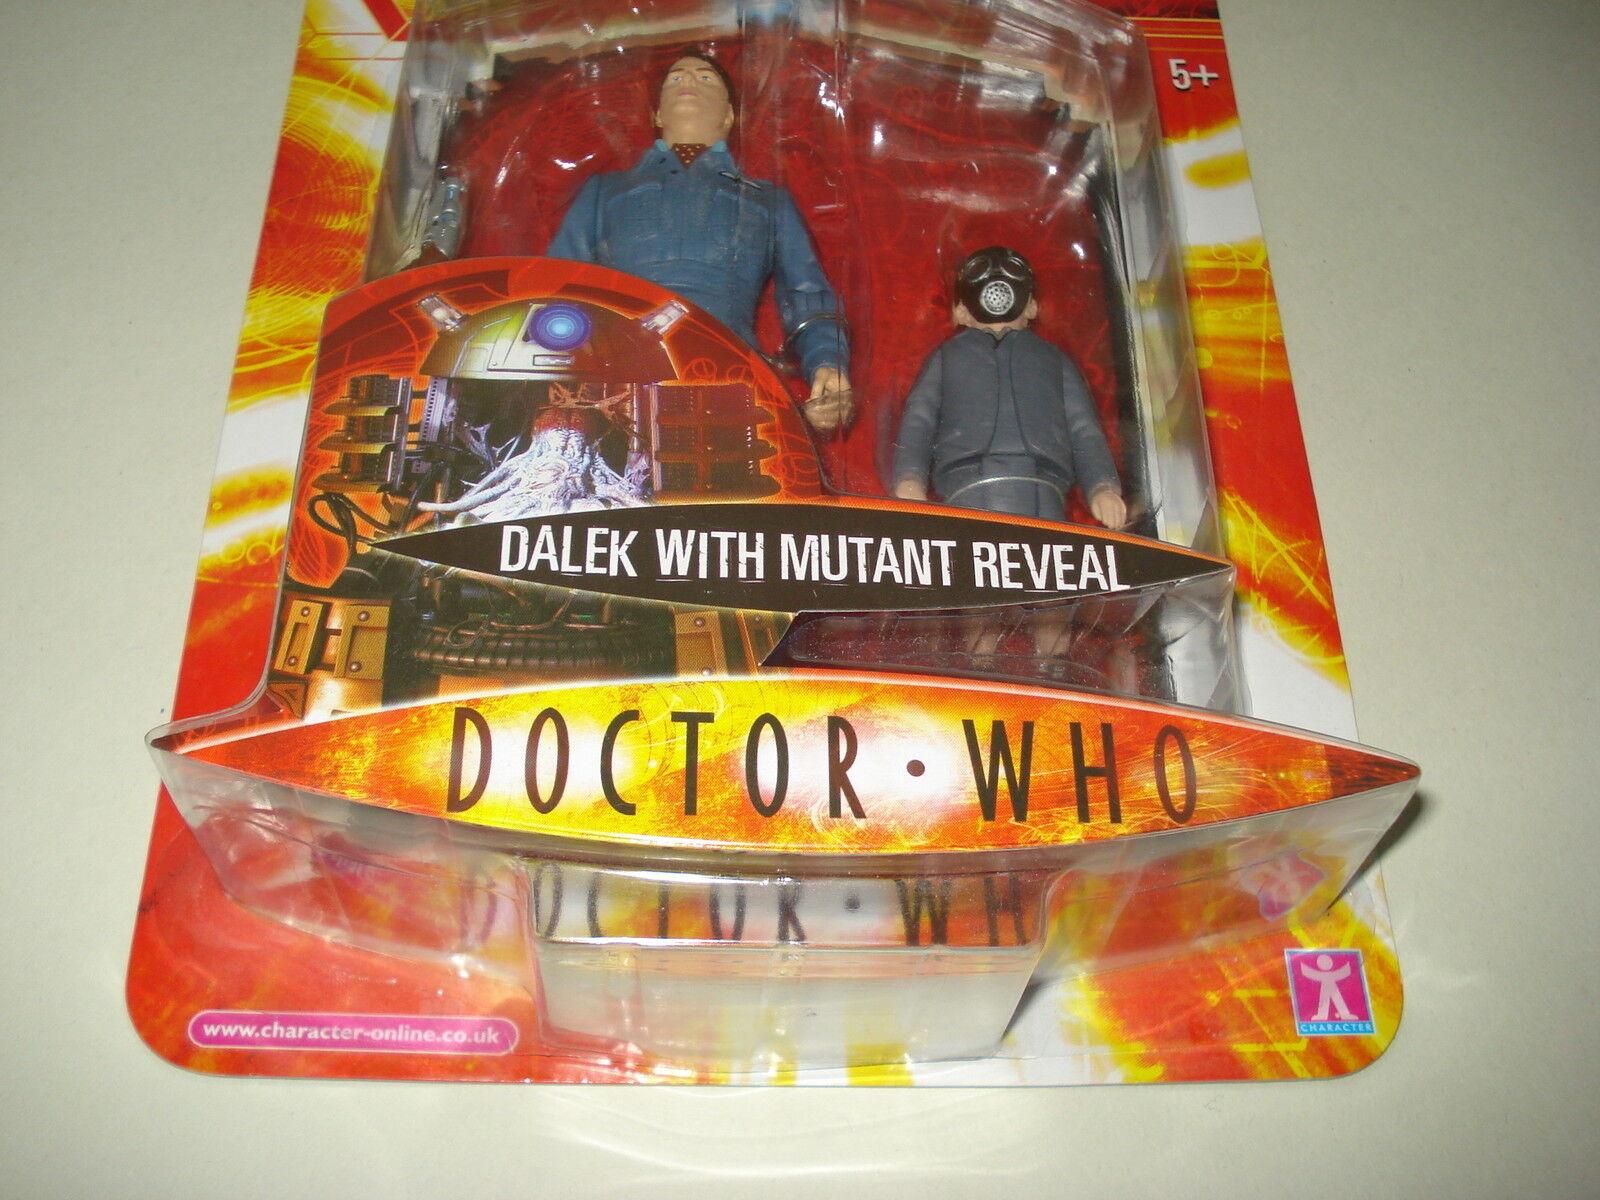 Doctor Who Dalek mutante revelan error de fábrica 5  Figura de Acción 2006 si usar En Blister Perfecto Estado Nuevo